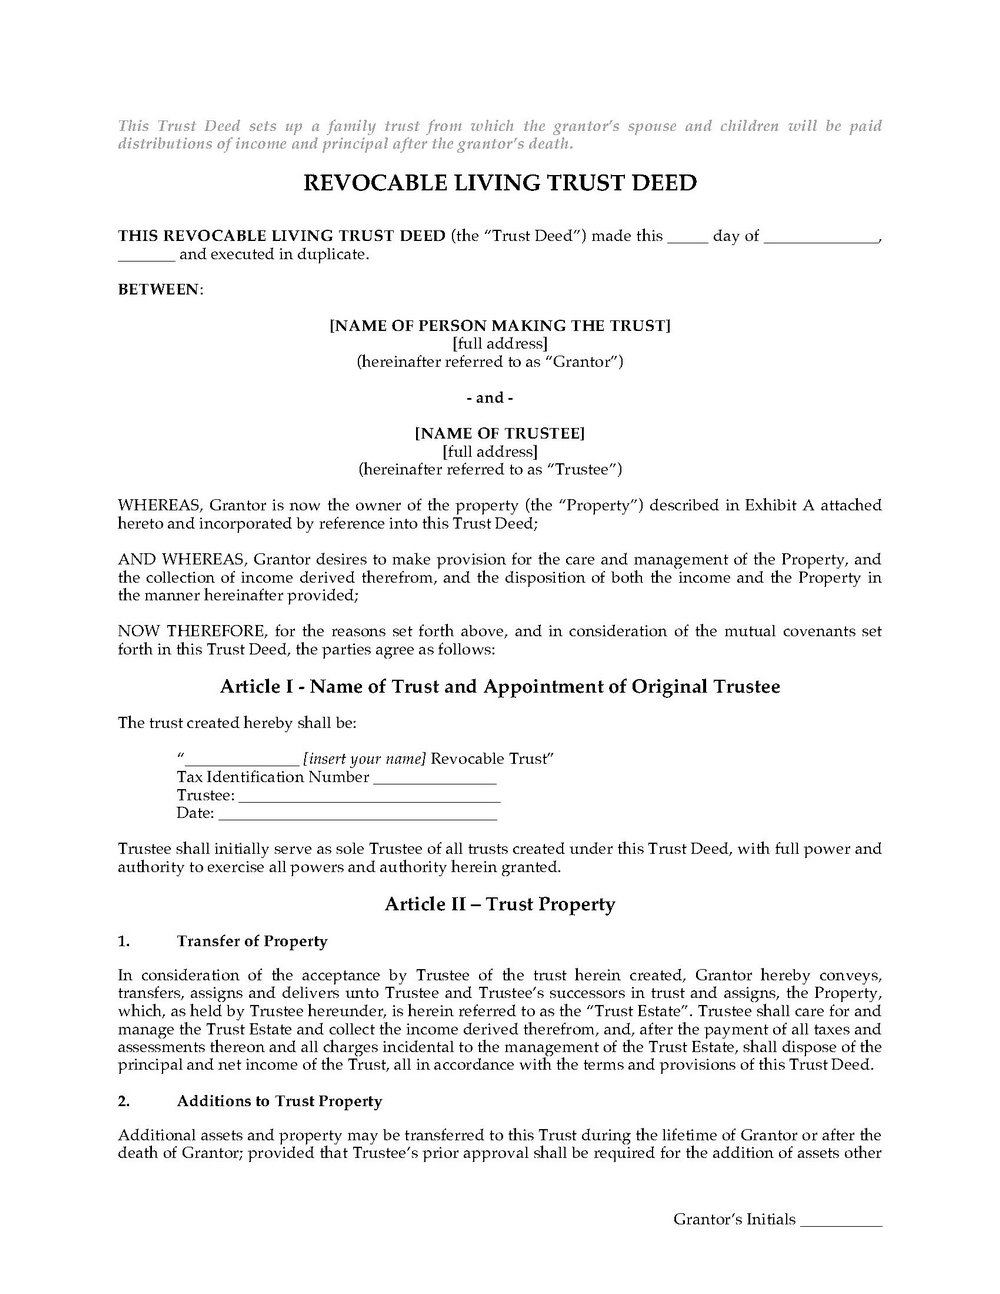 California Revocable Living Trust Form